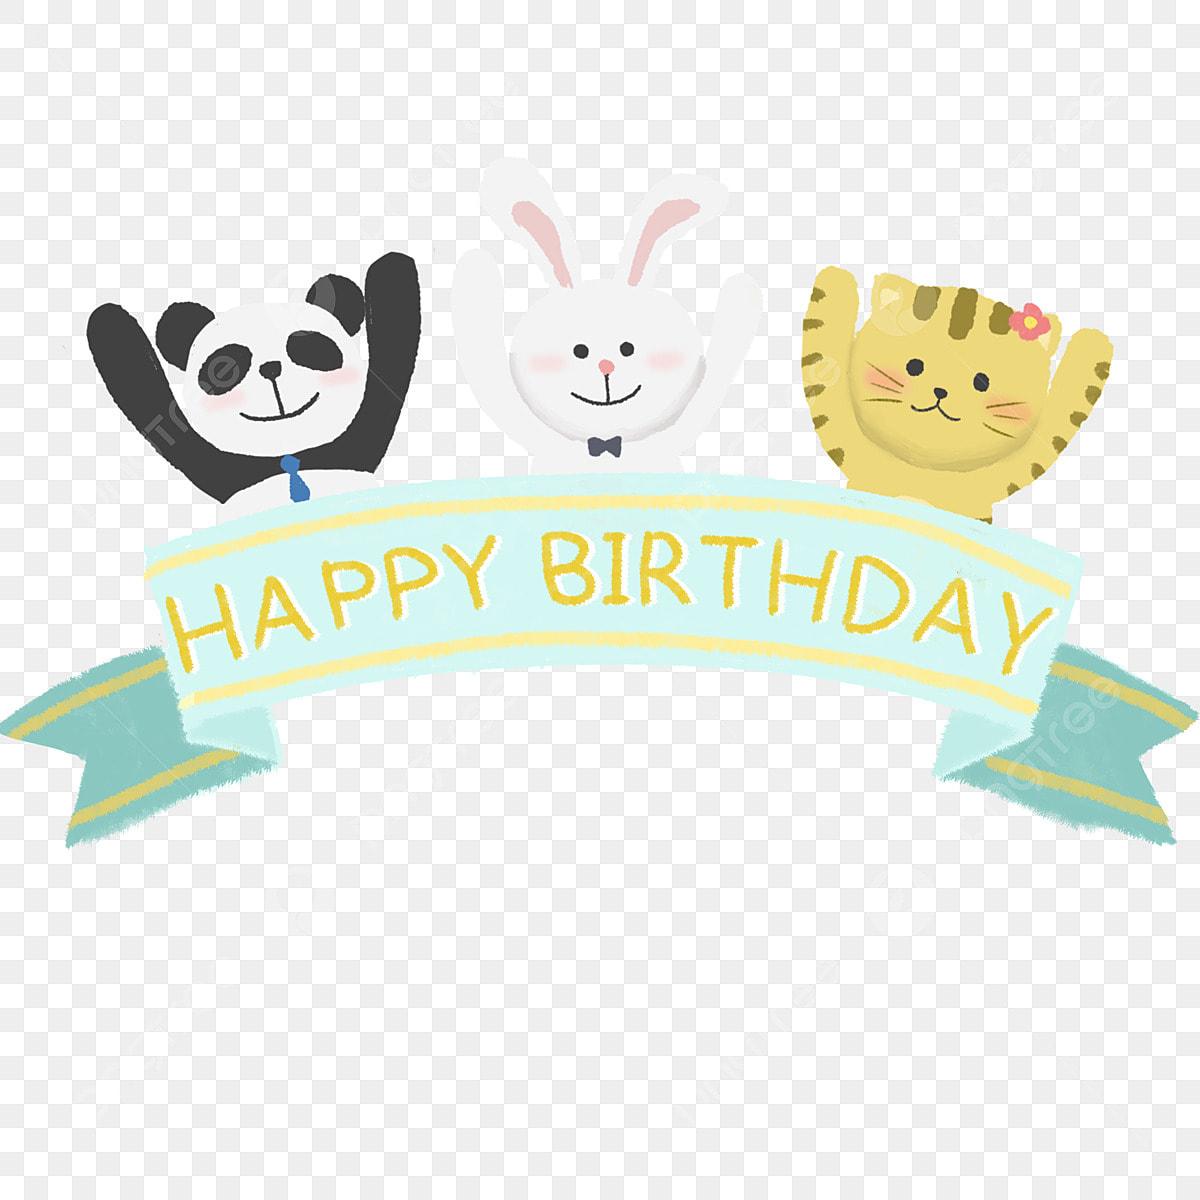 Panda bear illustration stock vector. Illustration of bakery - 113040874